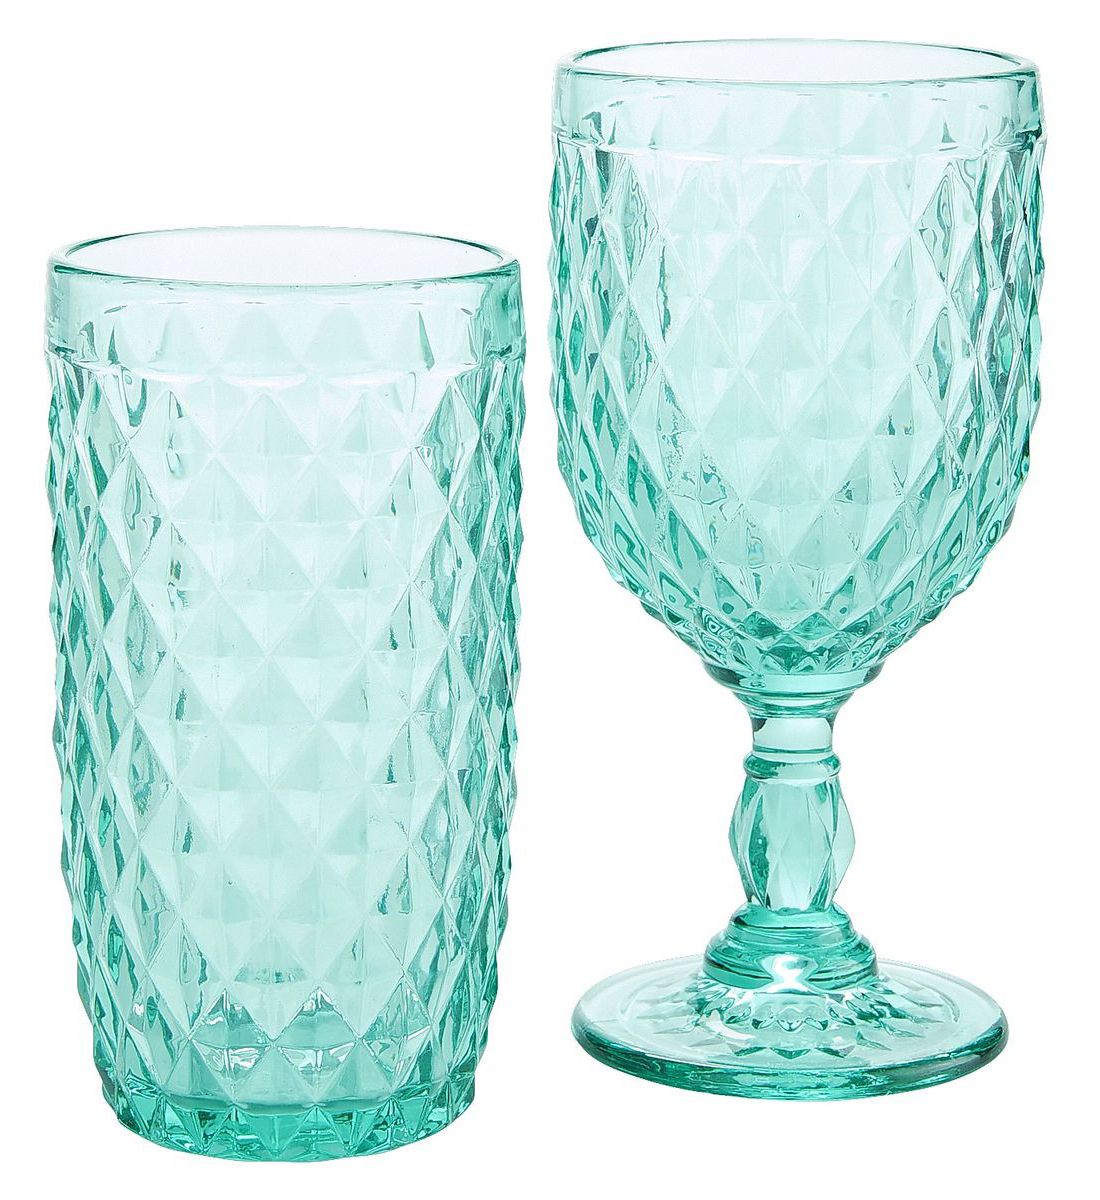 Turquoise Diamond Cut Glassware